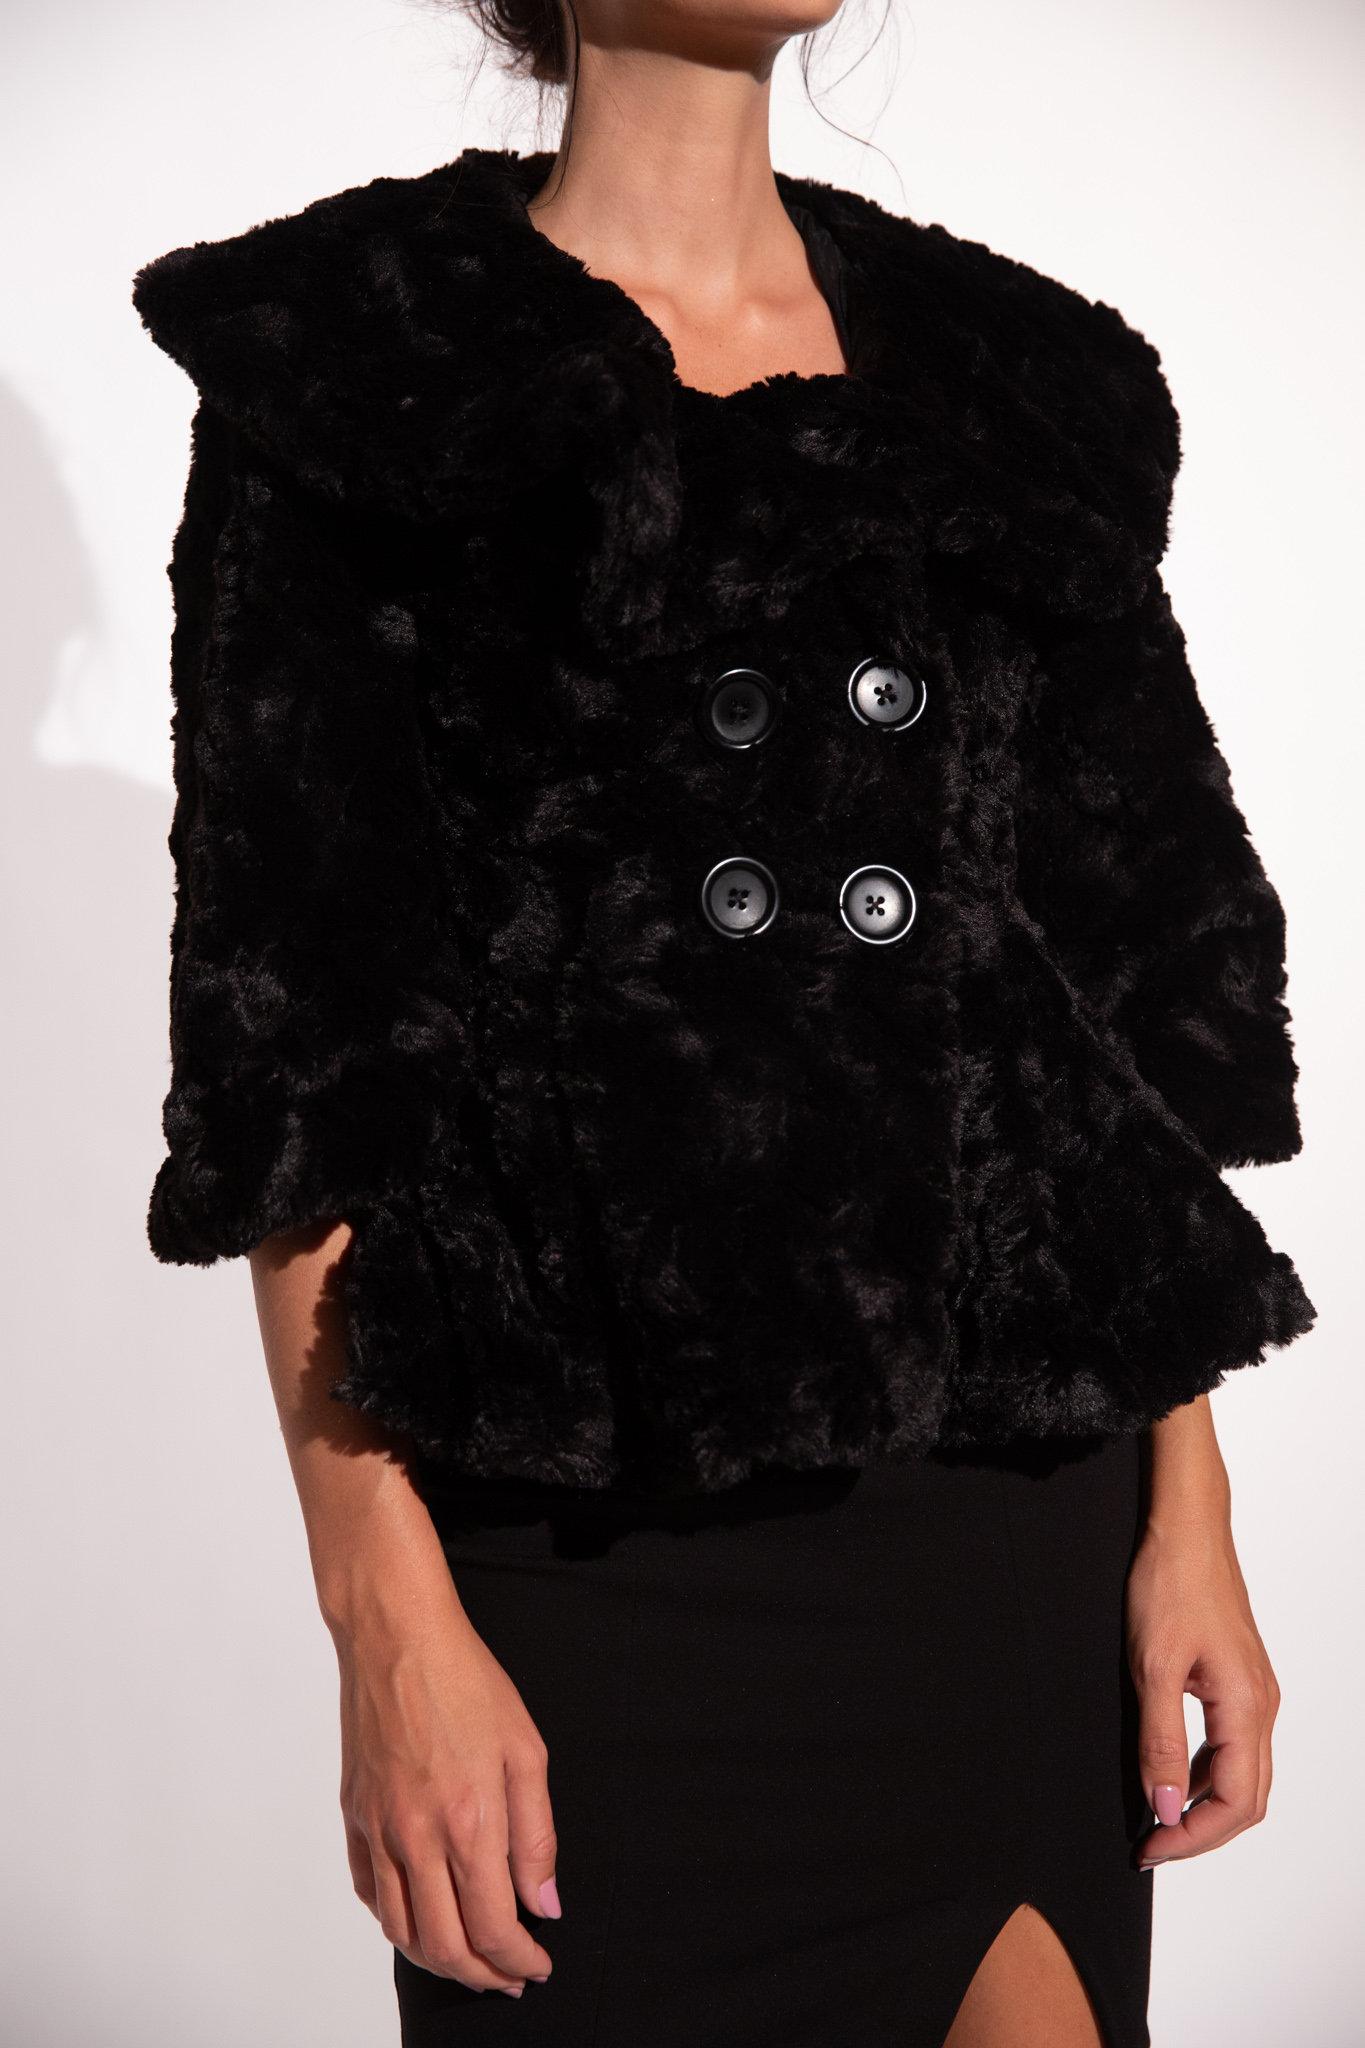 SACHIKA Zendaya Dress + Jackie O Coat